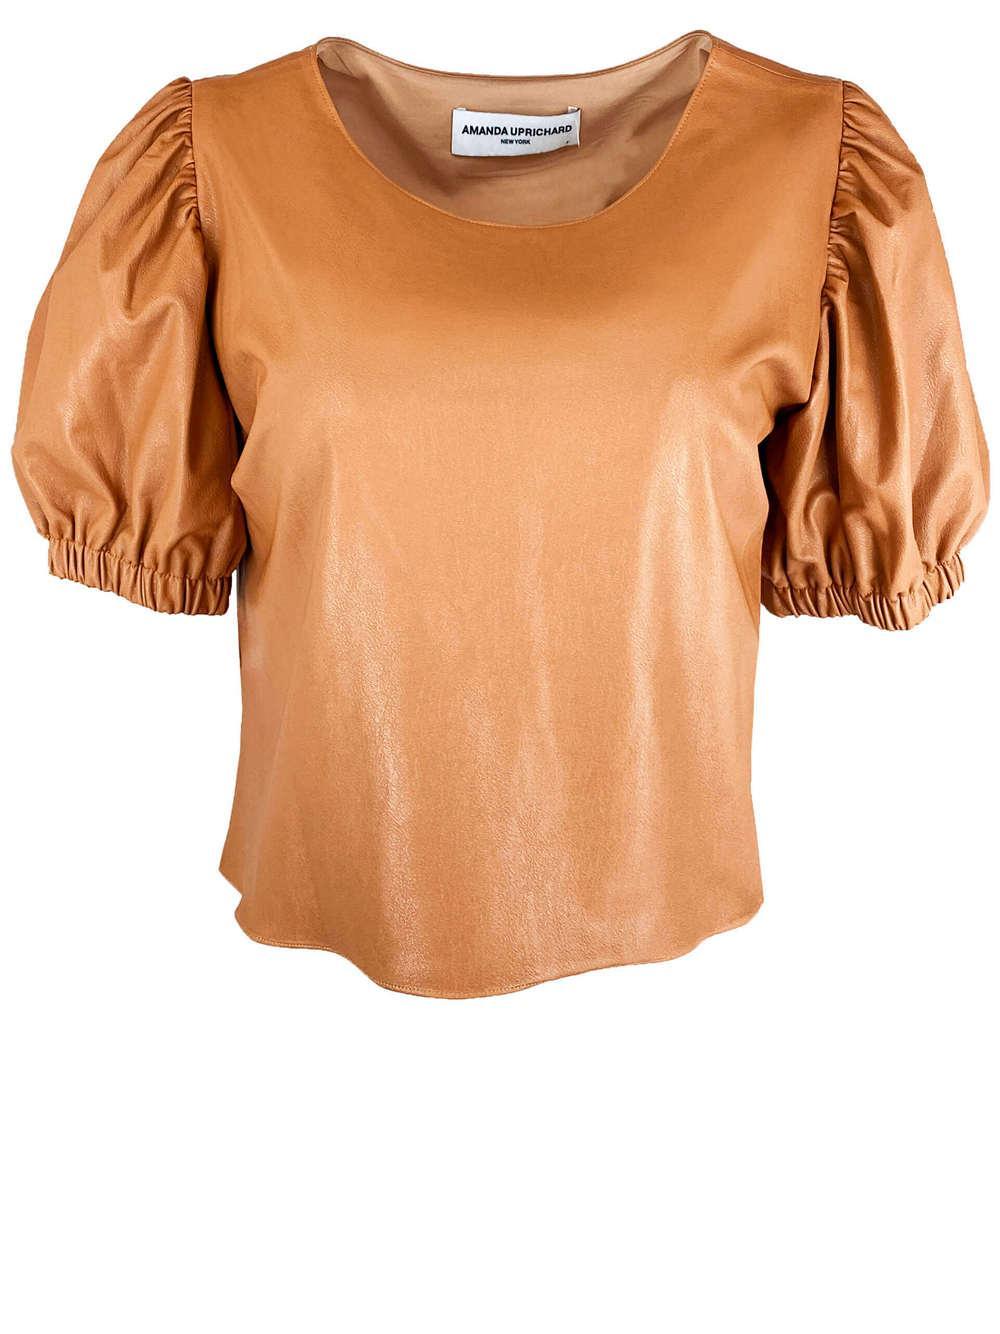 Heidi Faux Leather Top